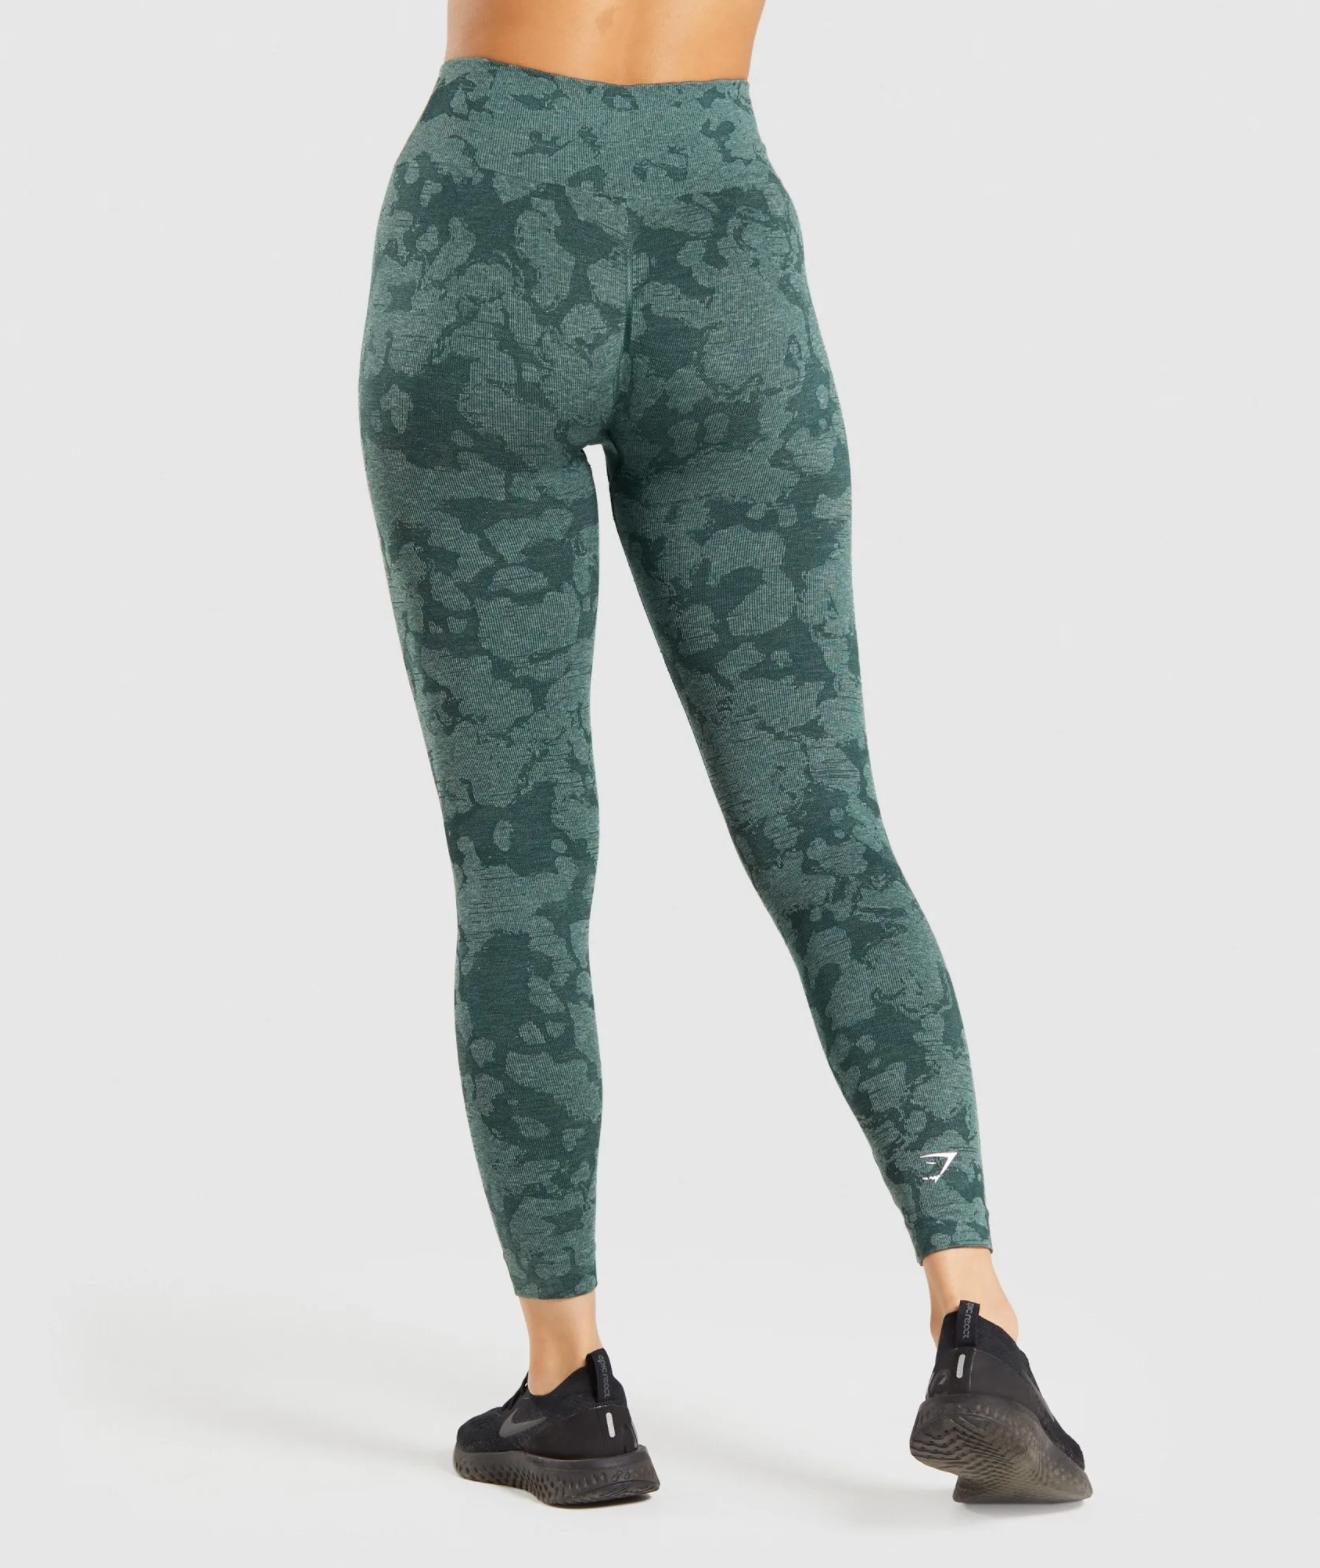 Adapt Camo Seamless Leggings in Obsidian Green